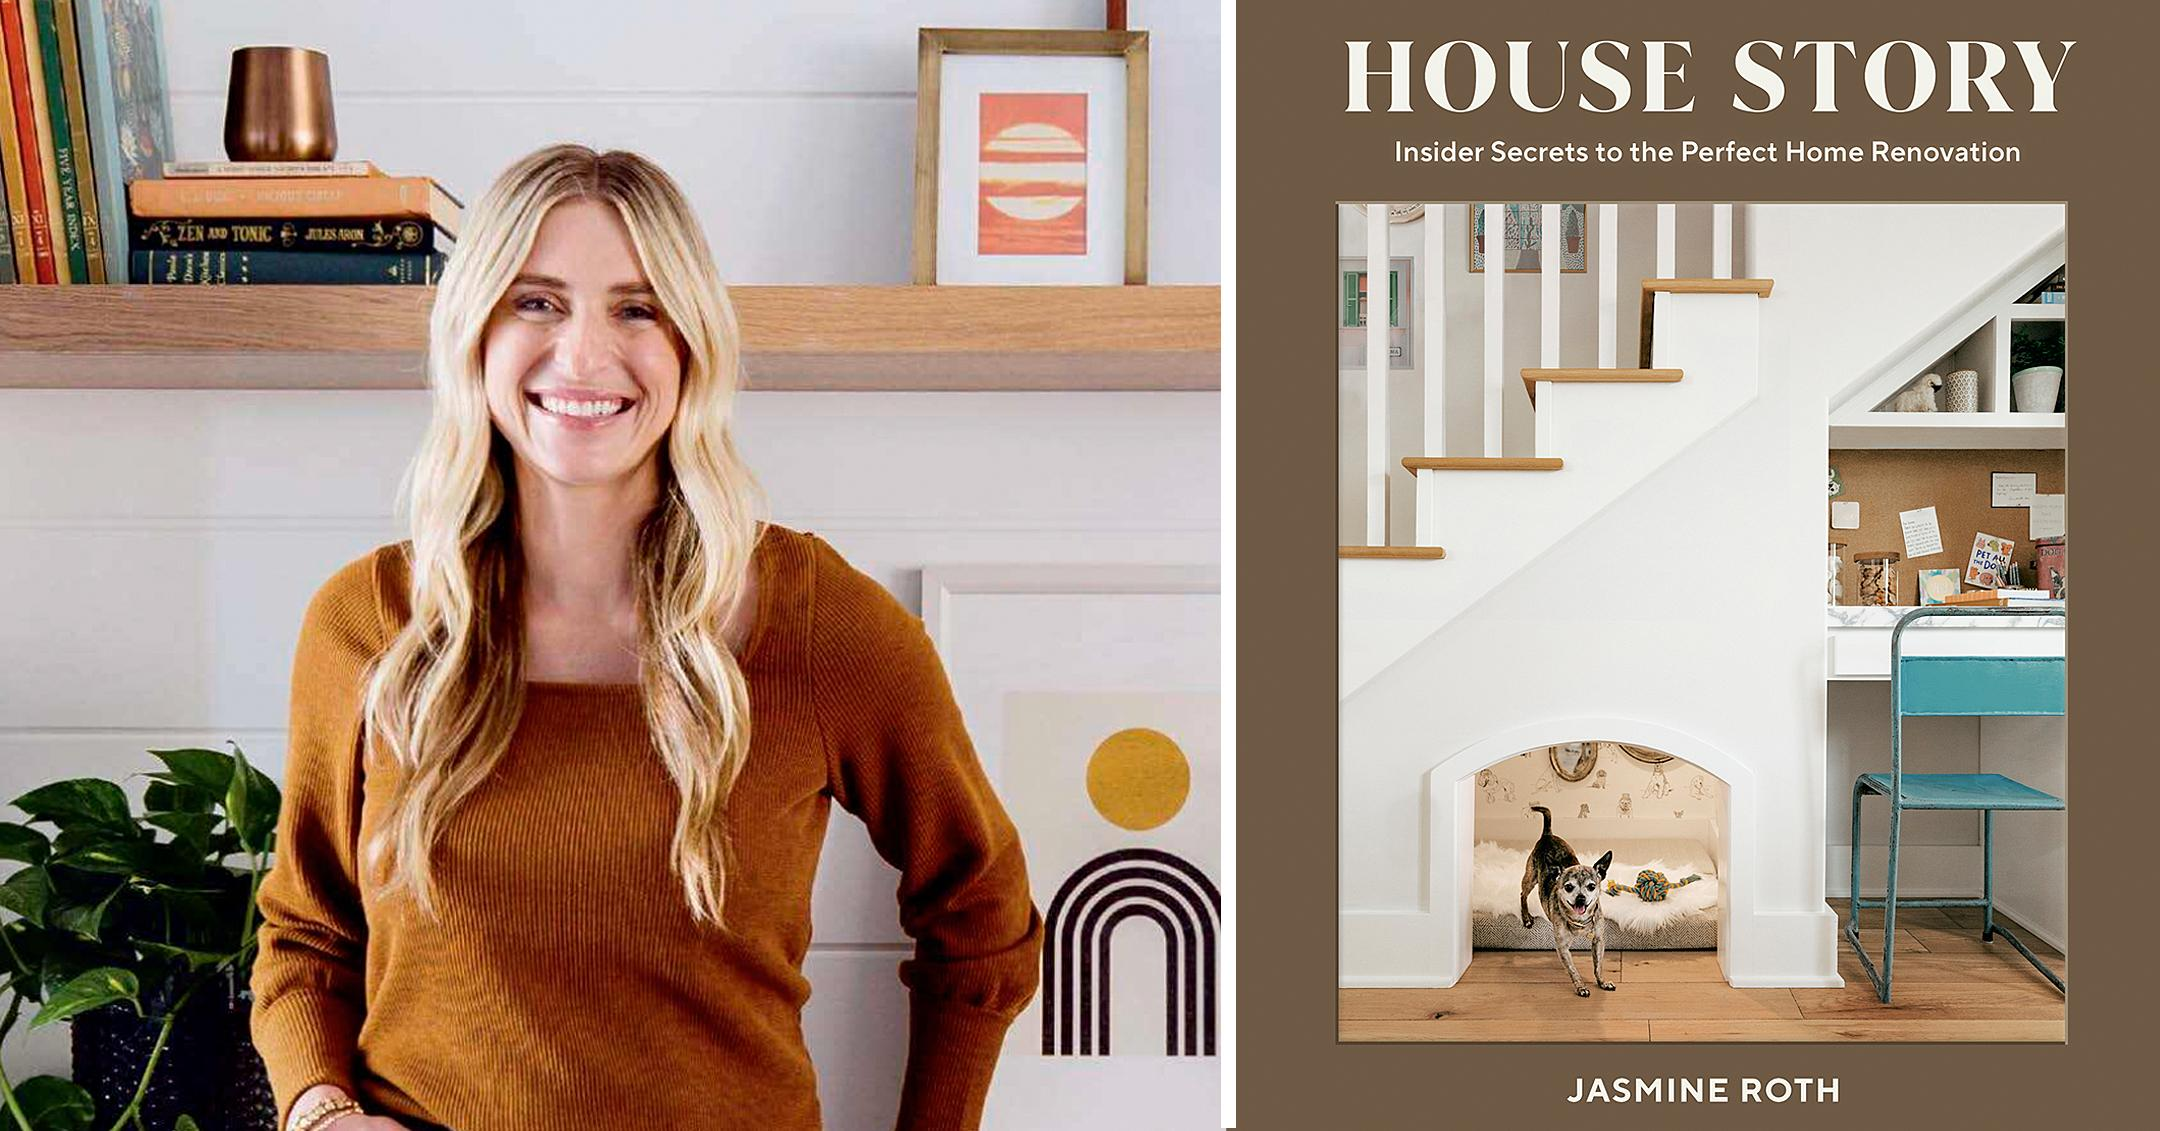 jasmine roths new book